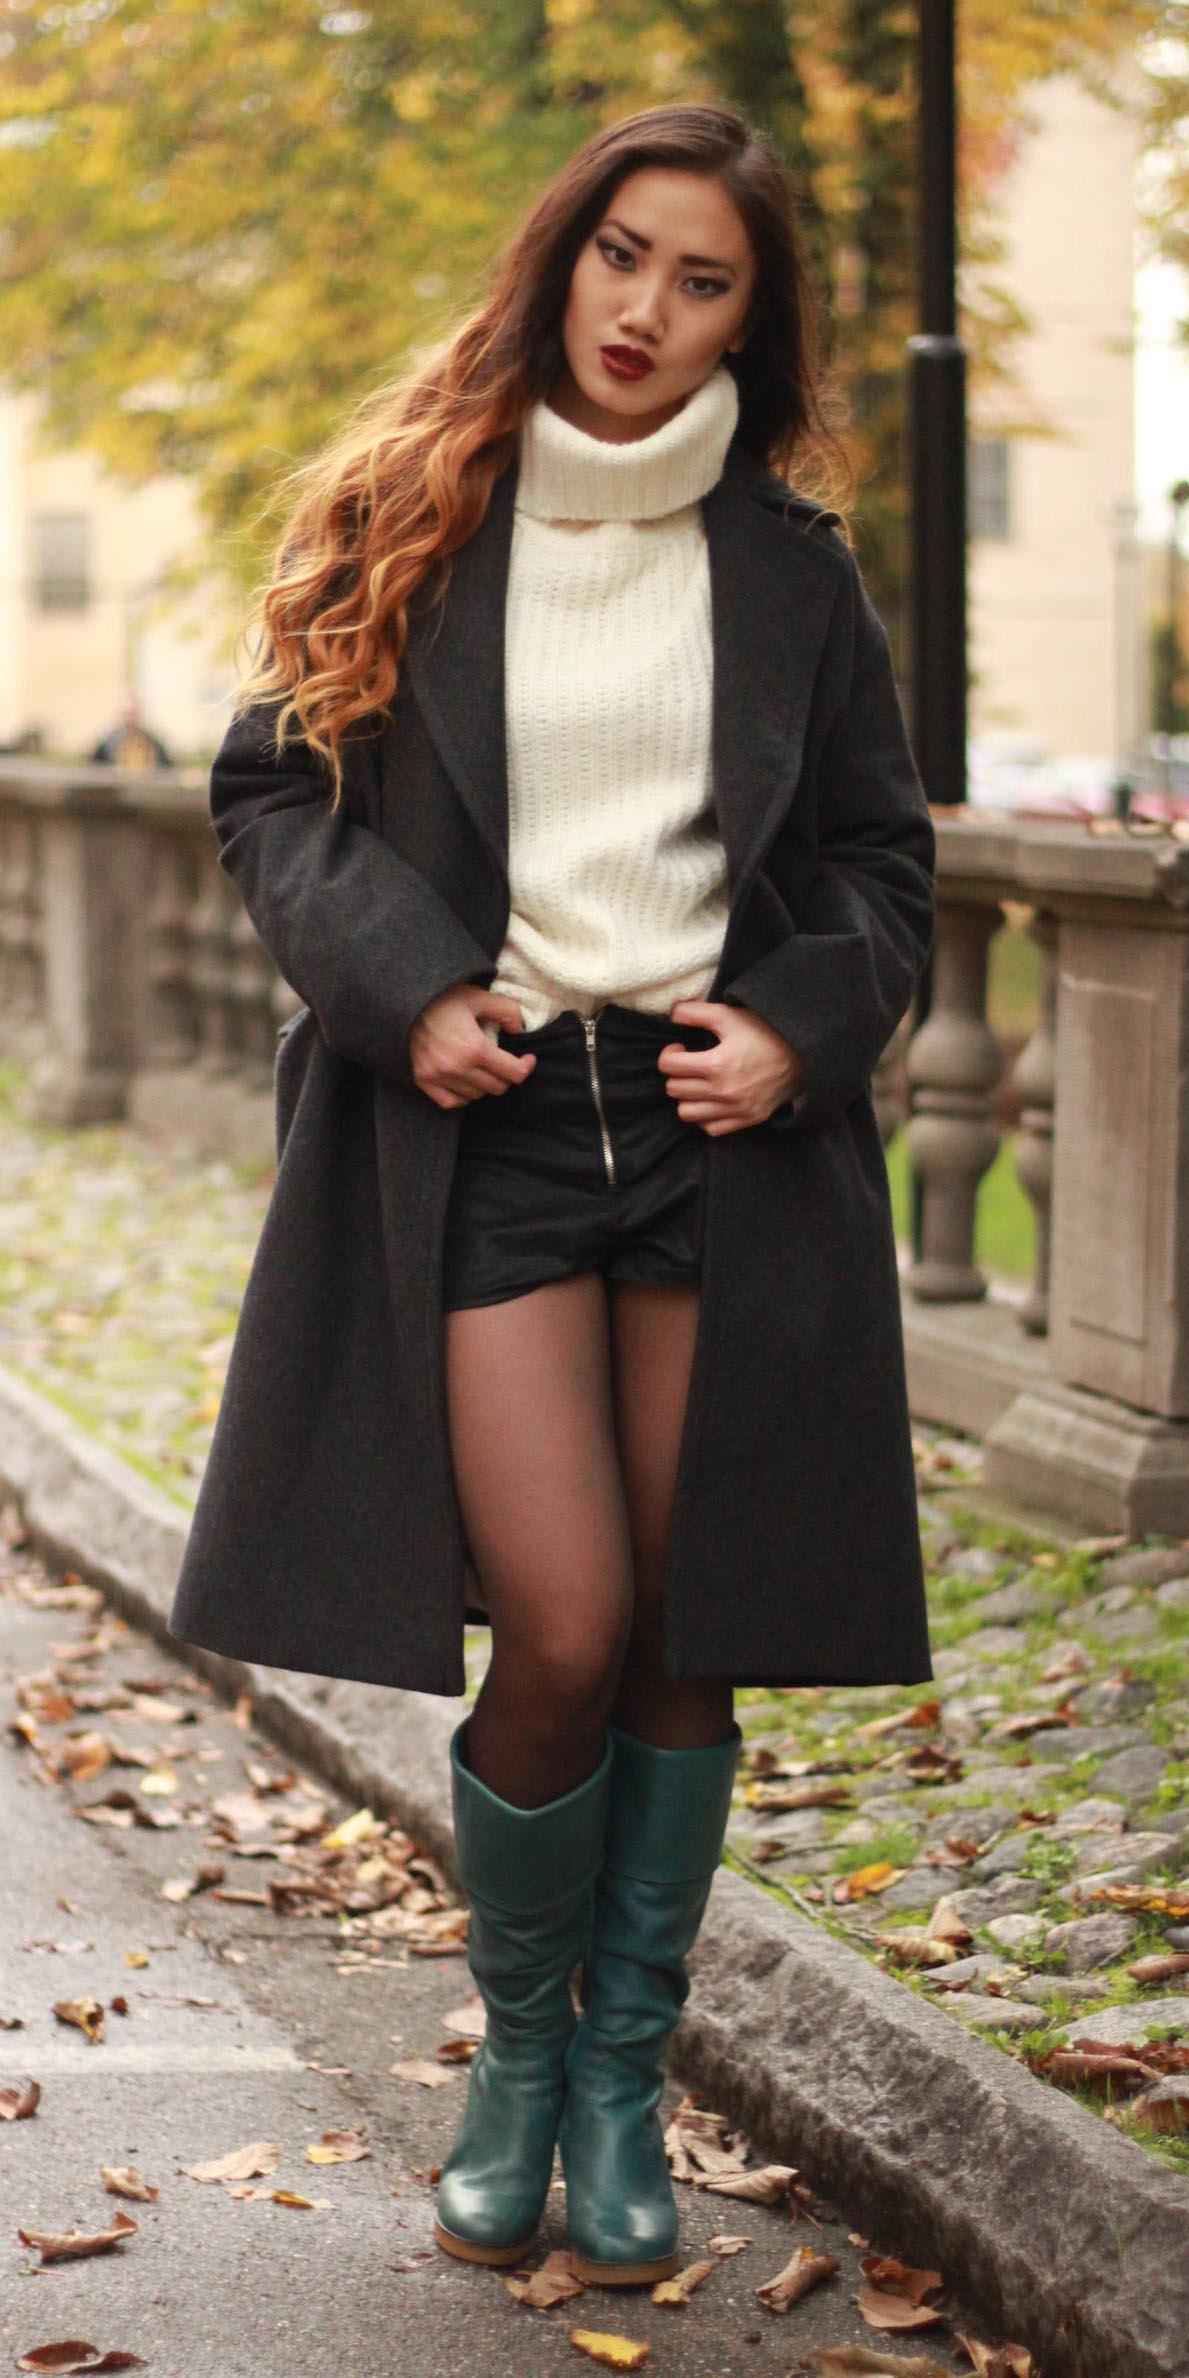 black-shorts-black-tights-white-sweater-turtleneck-green-shoe-boots-black-jacket-coat-fall-winter-hairr-dinner.jpg